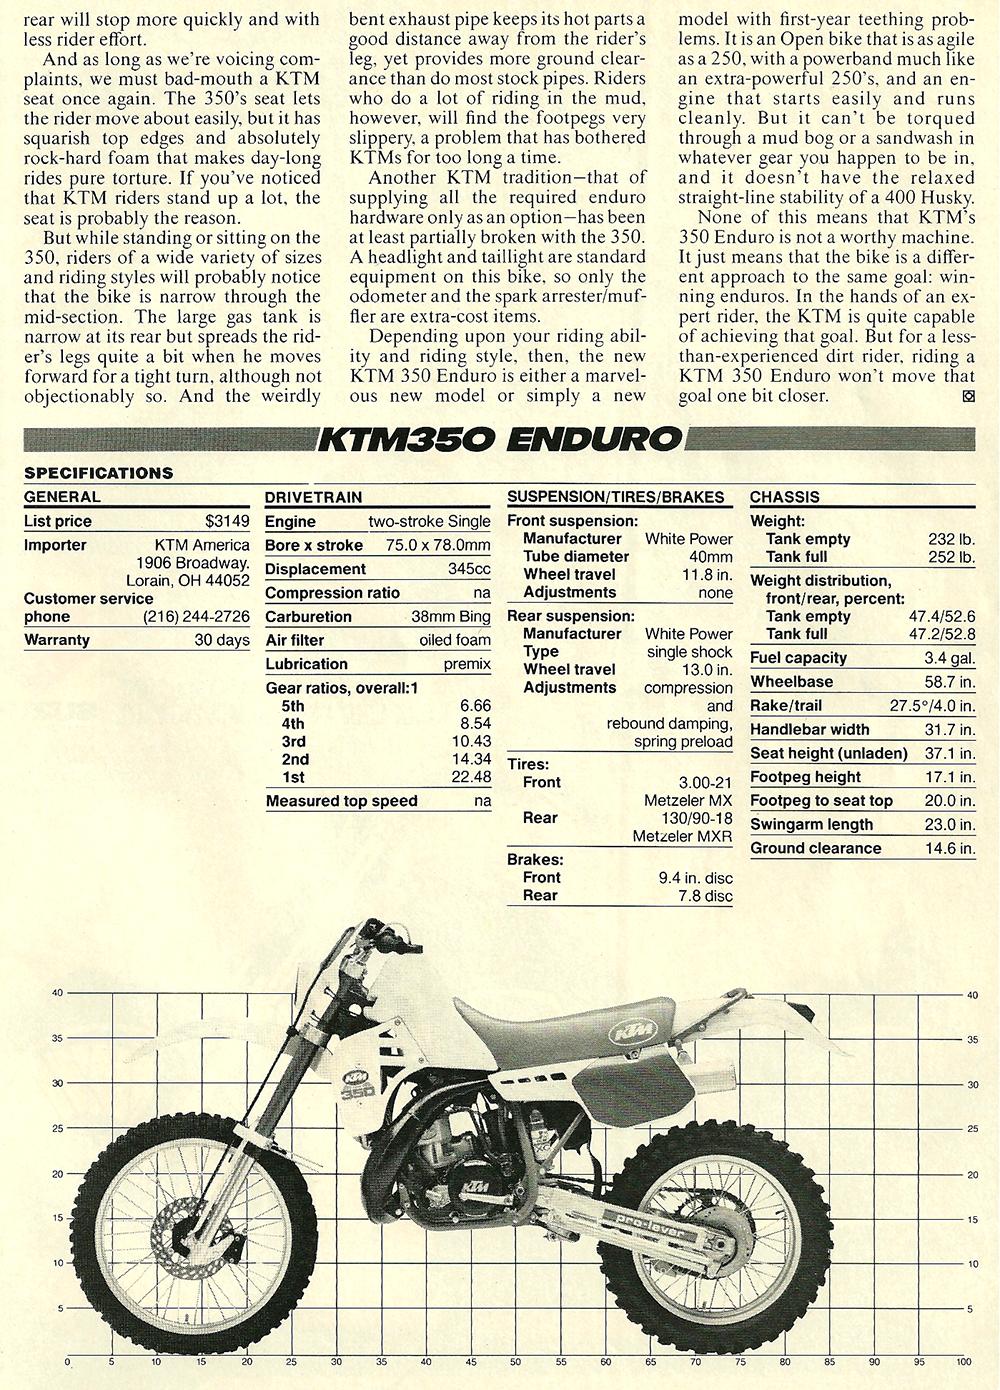 1986 KTM 350 enduro road test 04.jpg